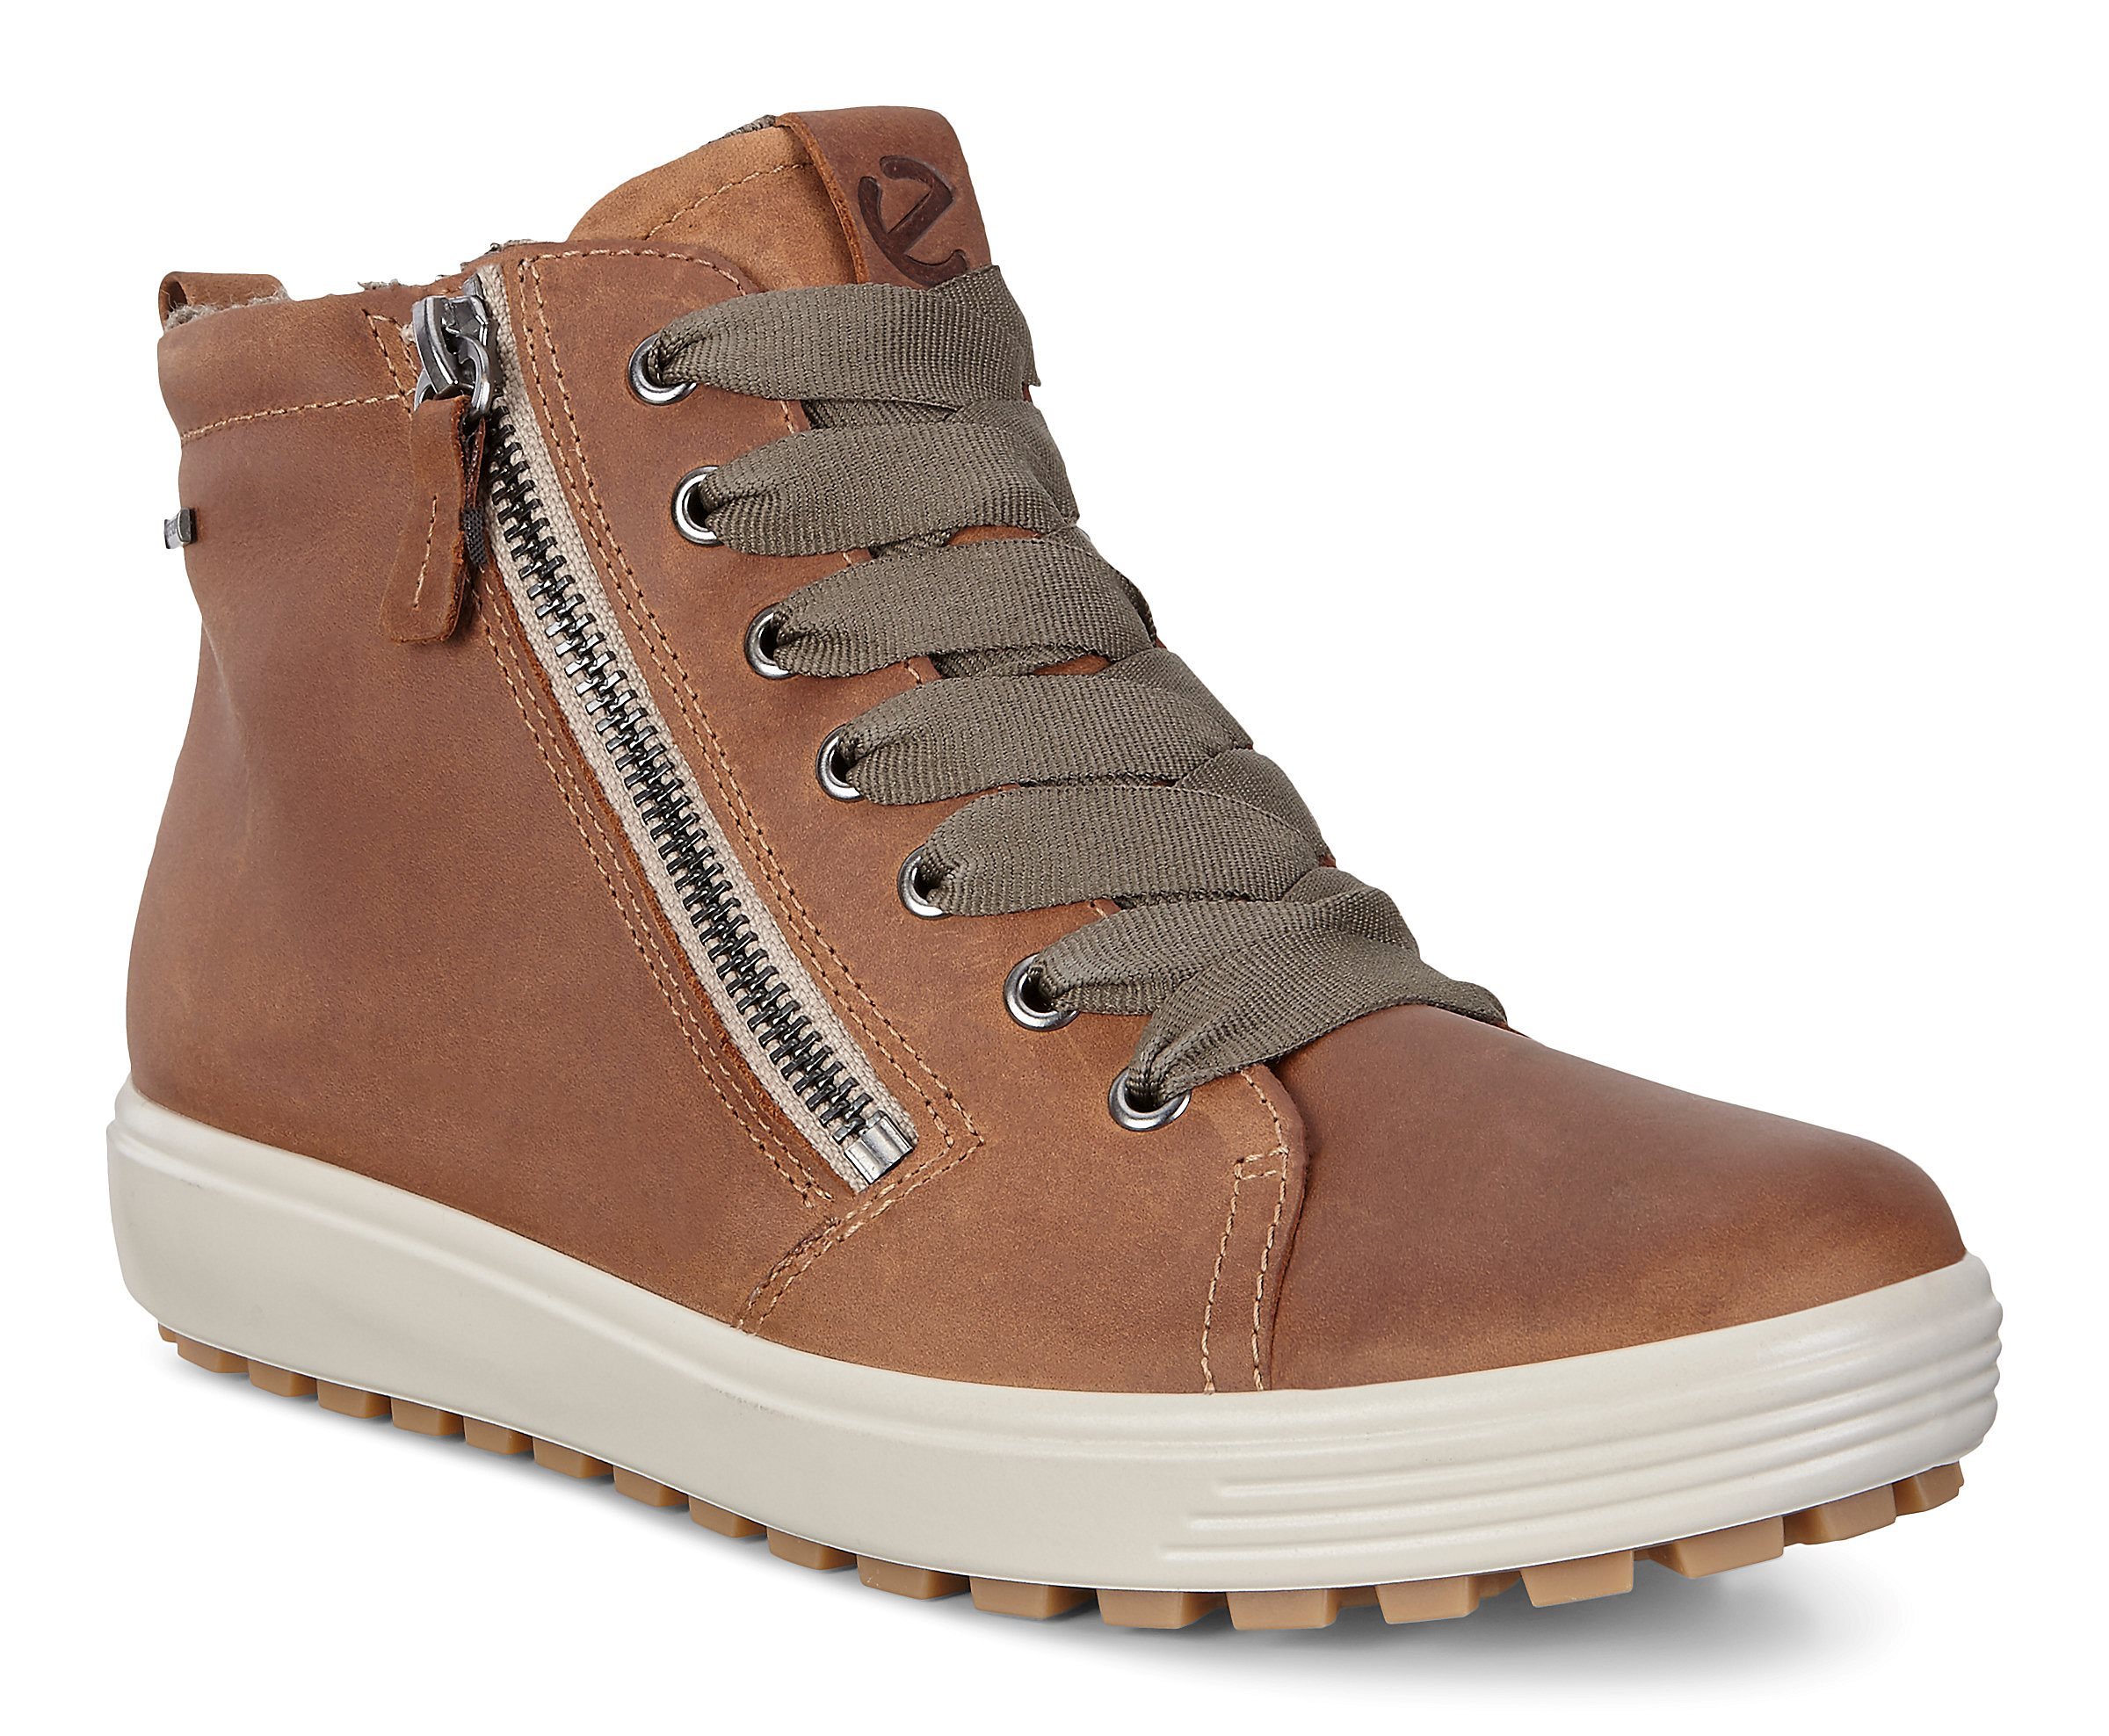 ECCO Soft 7 | Womens boots, Women shoes, Shoes